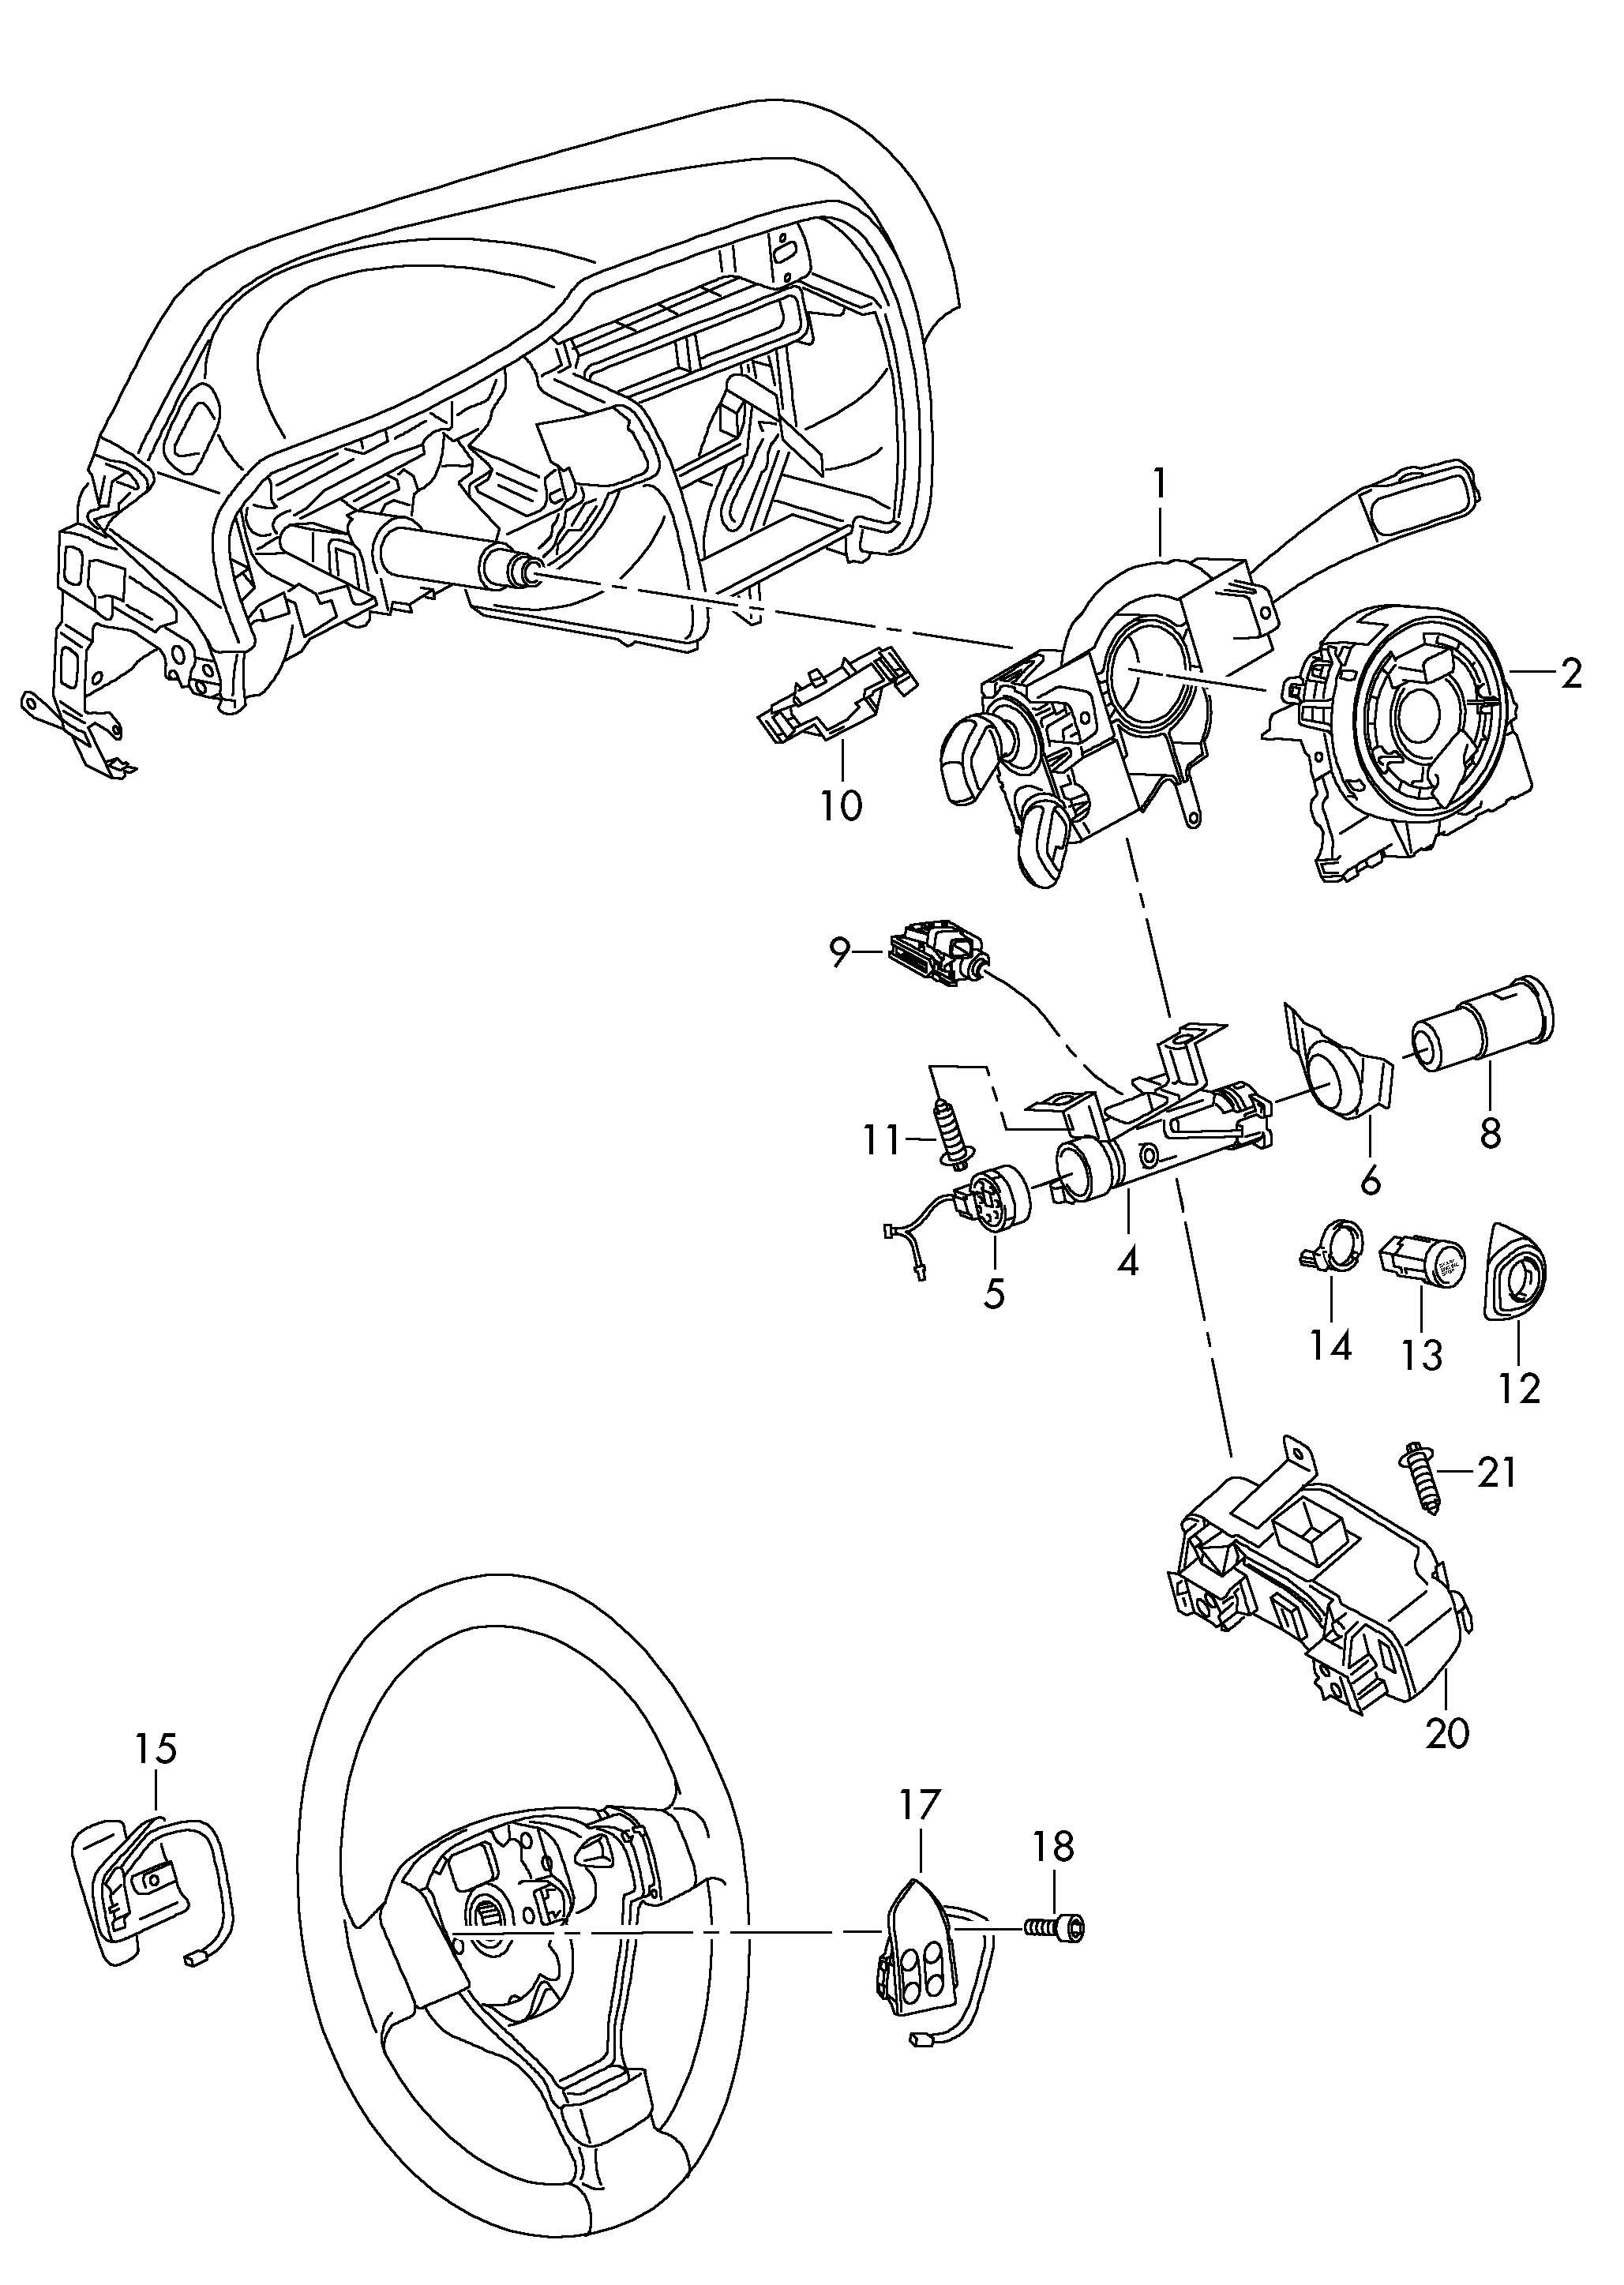 vw golf mk4 parts diagram pj trailer wiring mk6 r engine imageresizertool com